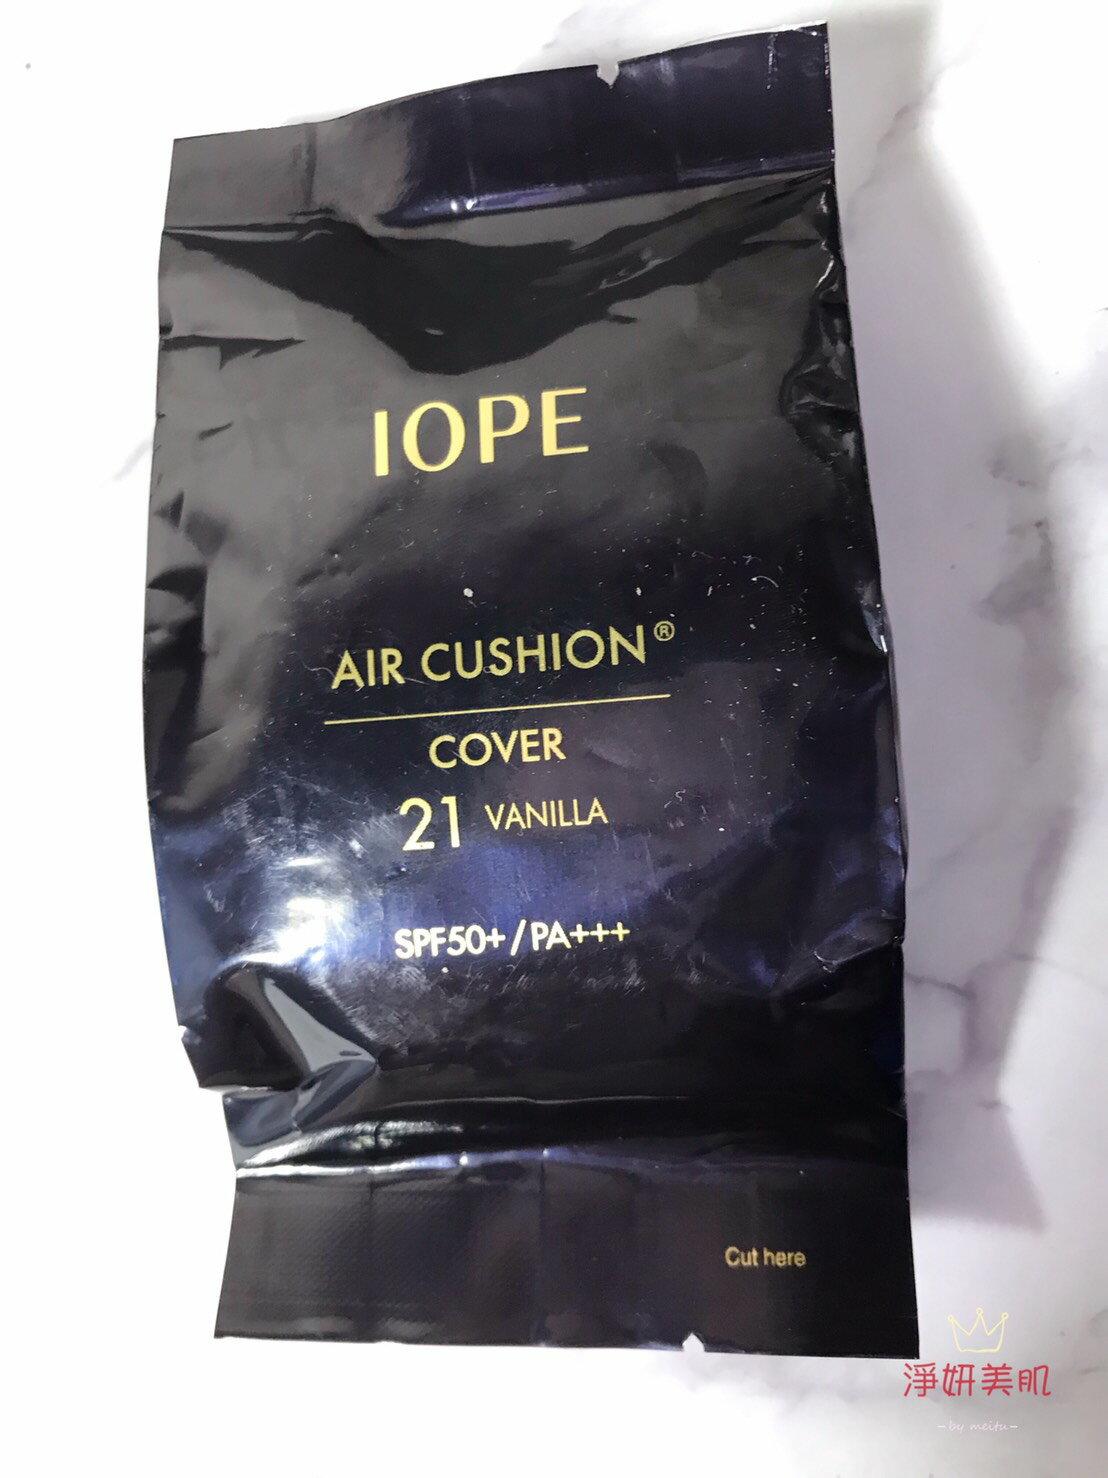 Iope 水潤光透氣墊粉餅 貝彩升級版 -COVER輕盈遮瑕款「補充包」補充蕊21號 5G  效期2020.09【淨妍美肌】 0